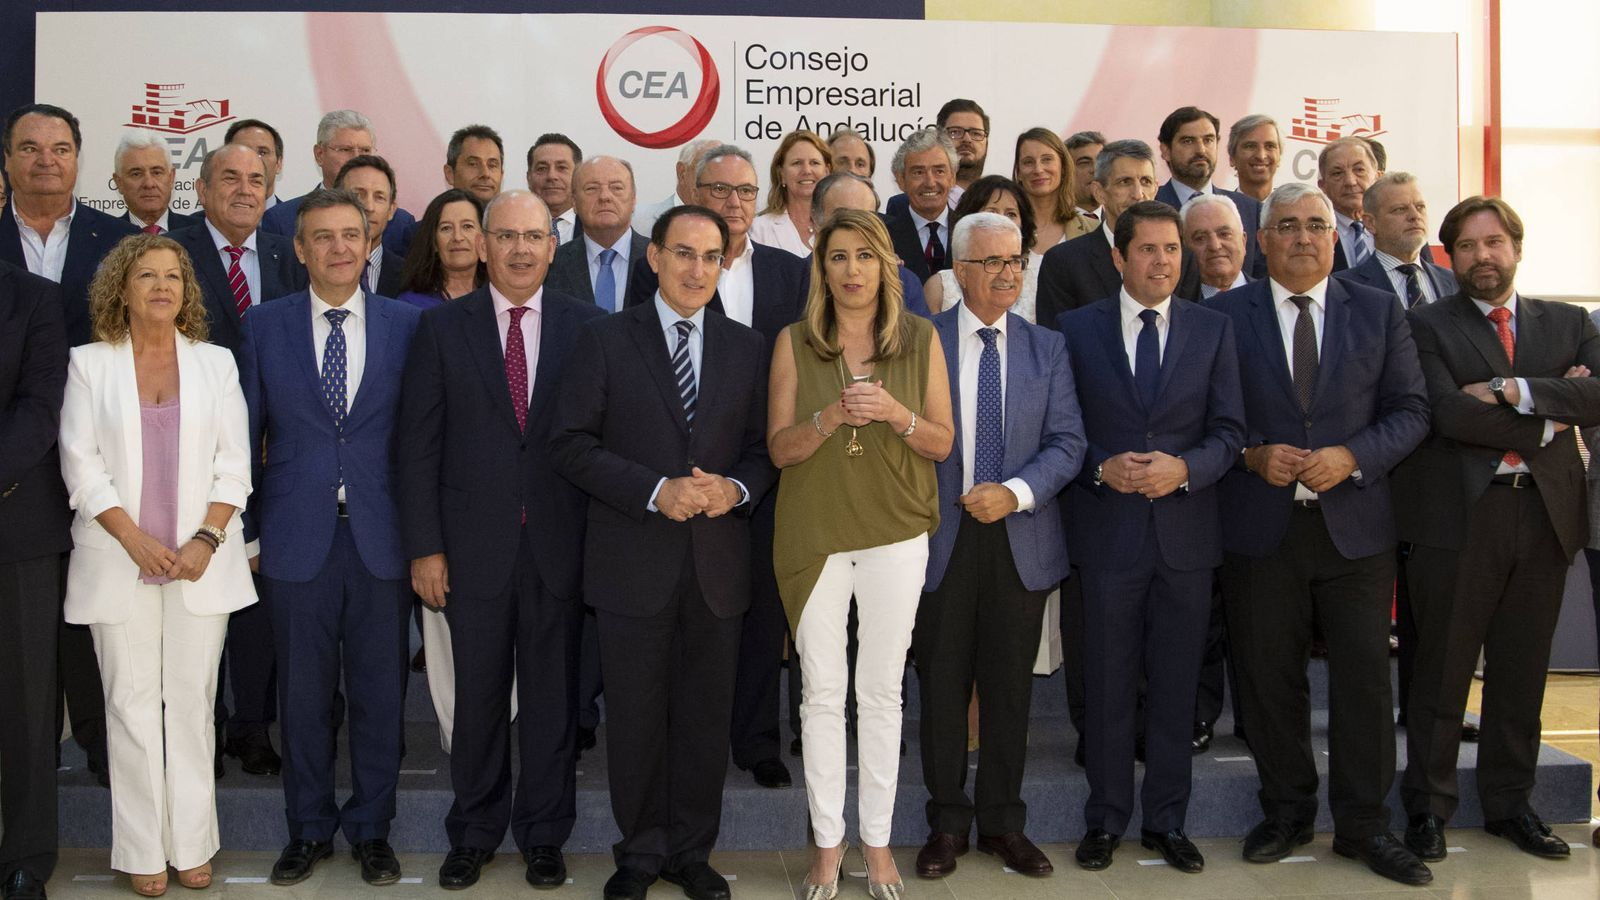 Foto: Foto de familia del Consejo Empresarial de Andalucía. (CEA)